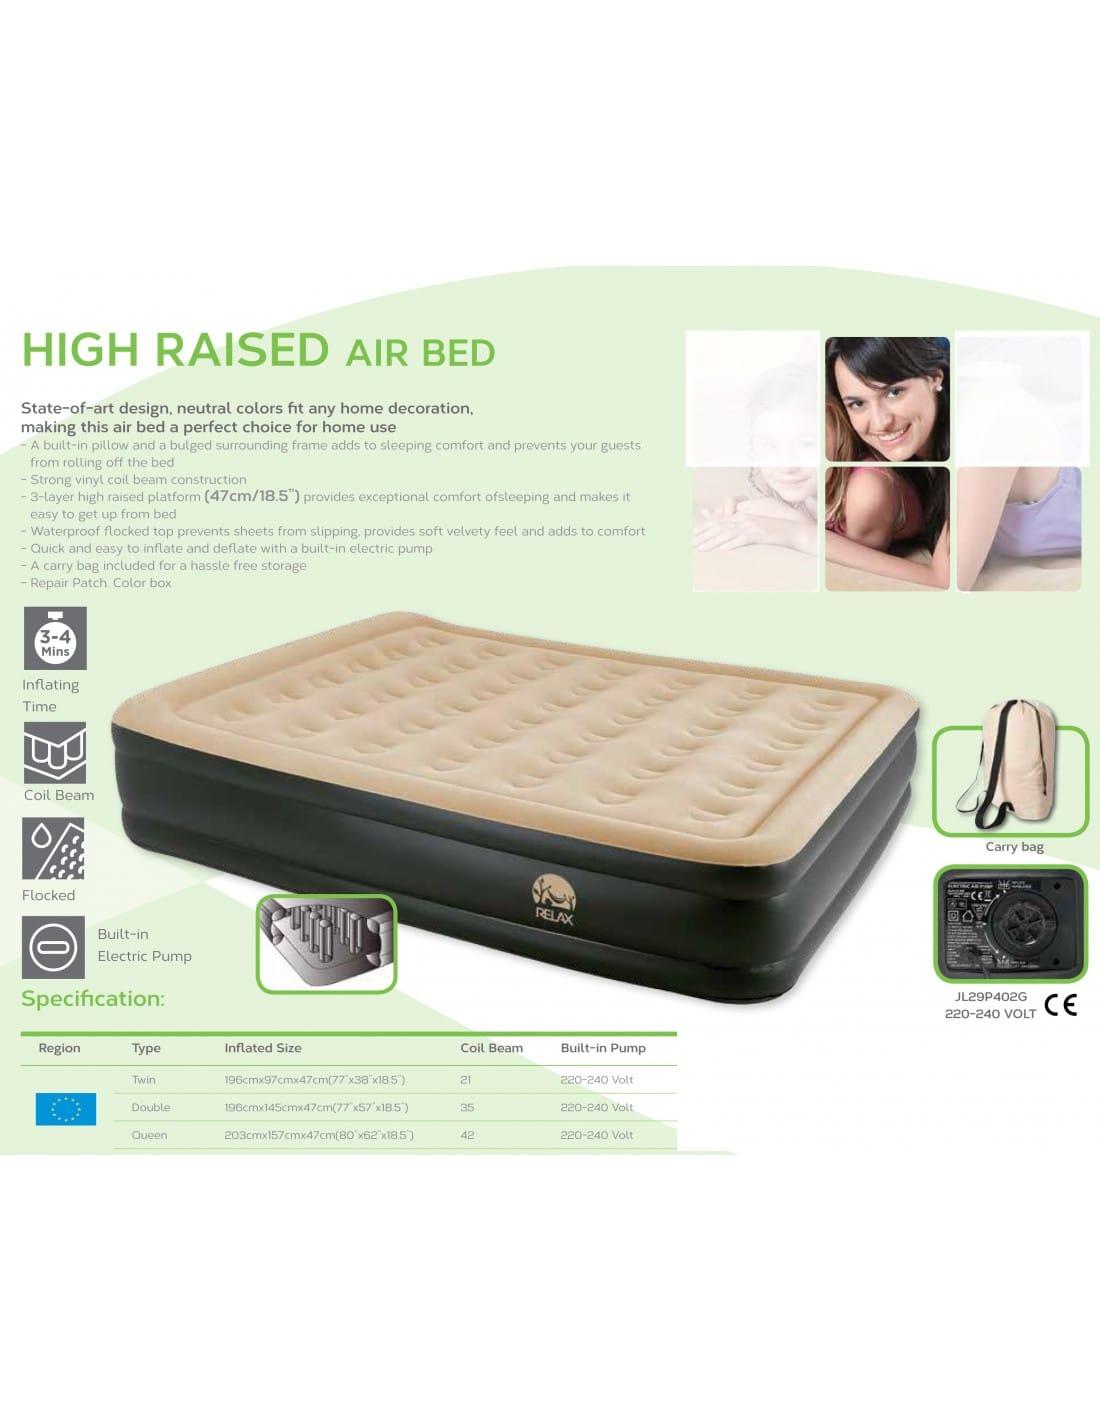 matelas lit gonflable floqu queen pompe lectrique. Black Bedroom Furniture Sets. Home Design Ideas